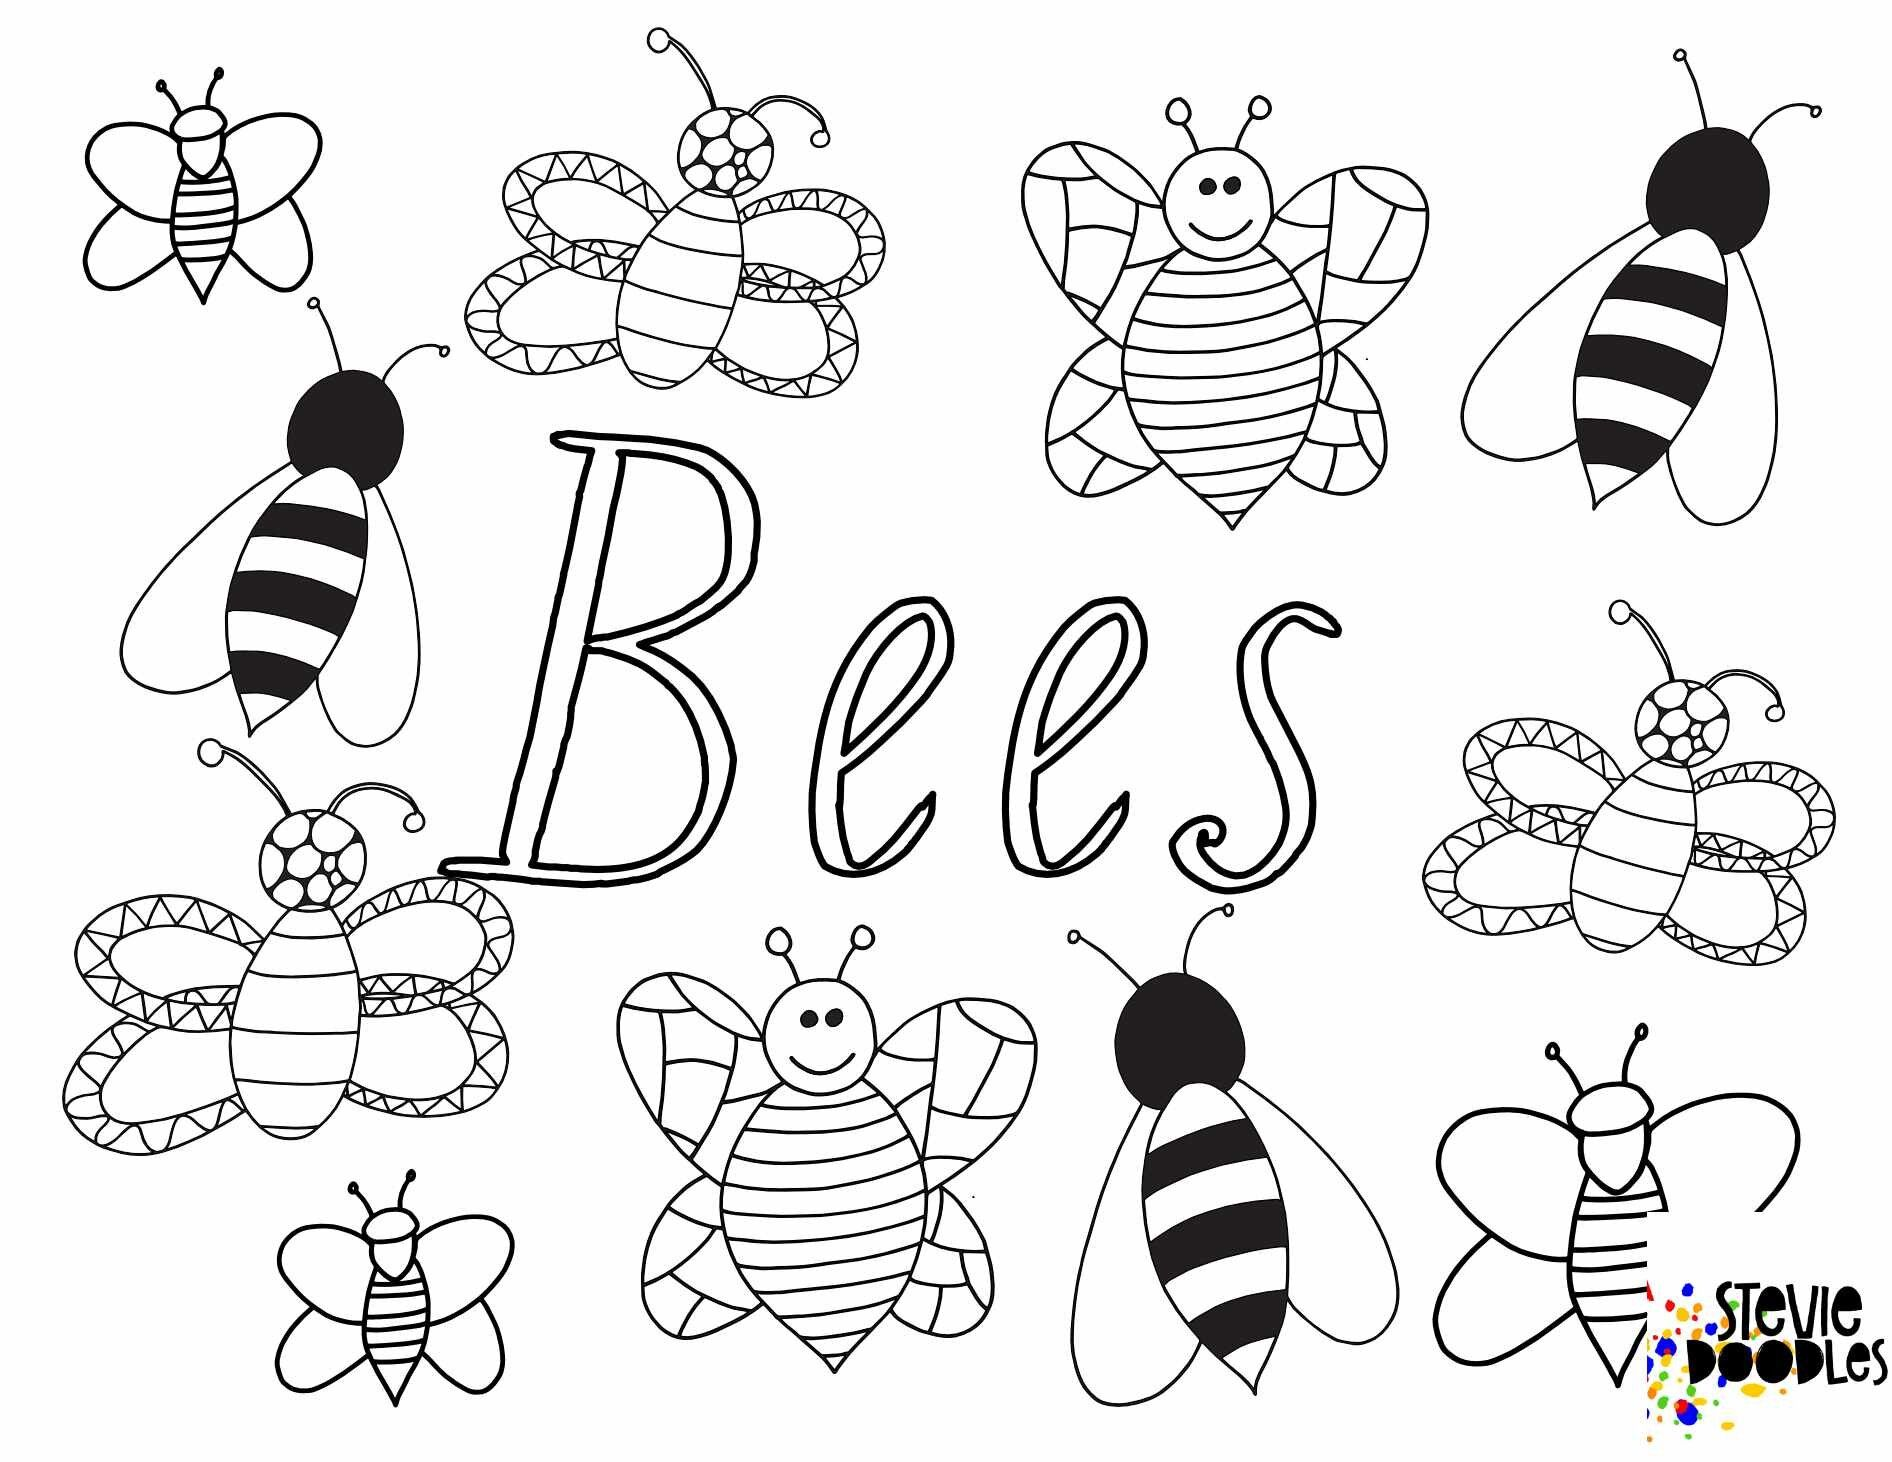 Bees Free Printable Coloring Page Stevie Doodles Bee Coloring Pages Free Printable Coloring Pages Free Kids Coloring Pages